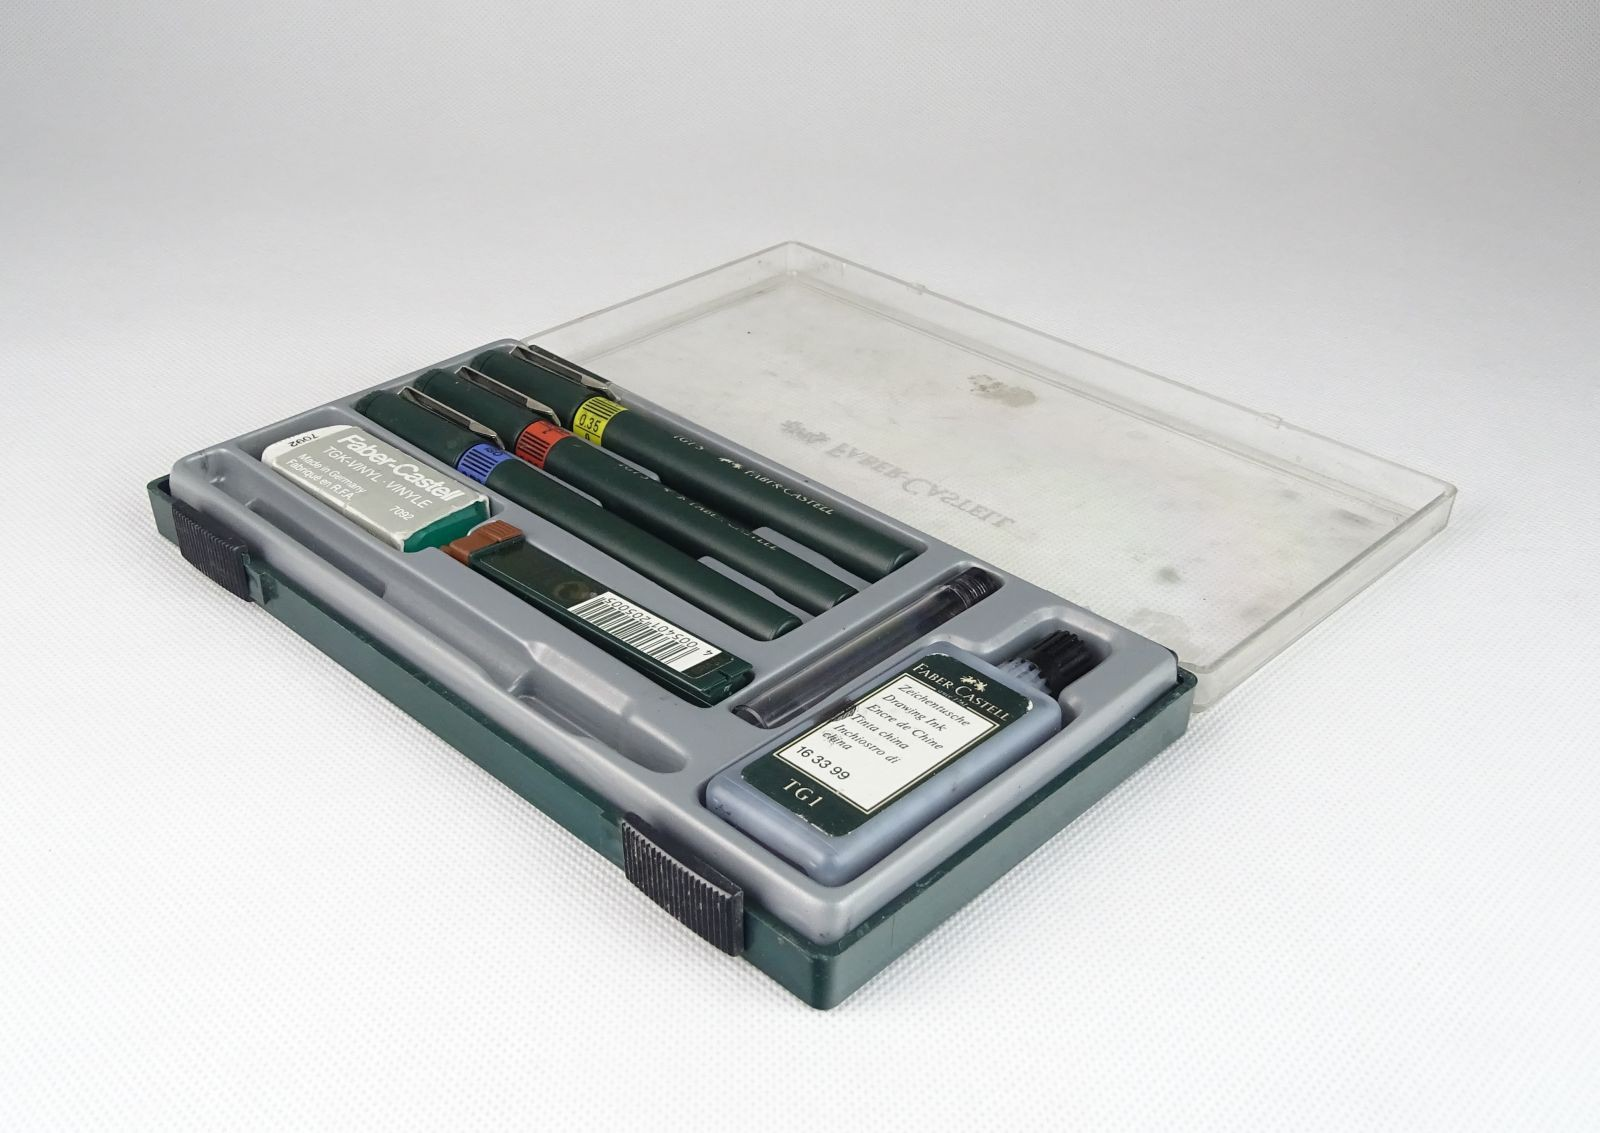 DSC08272.JPG (1600×1133)